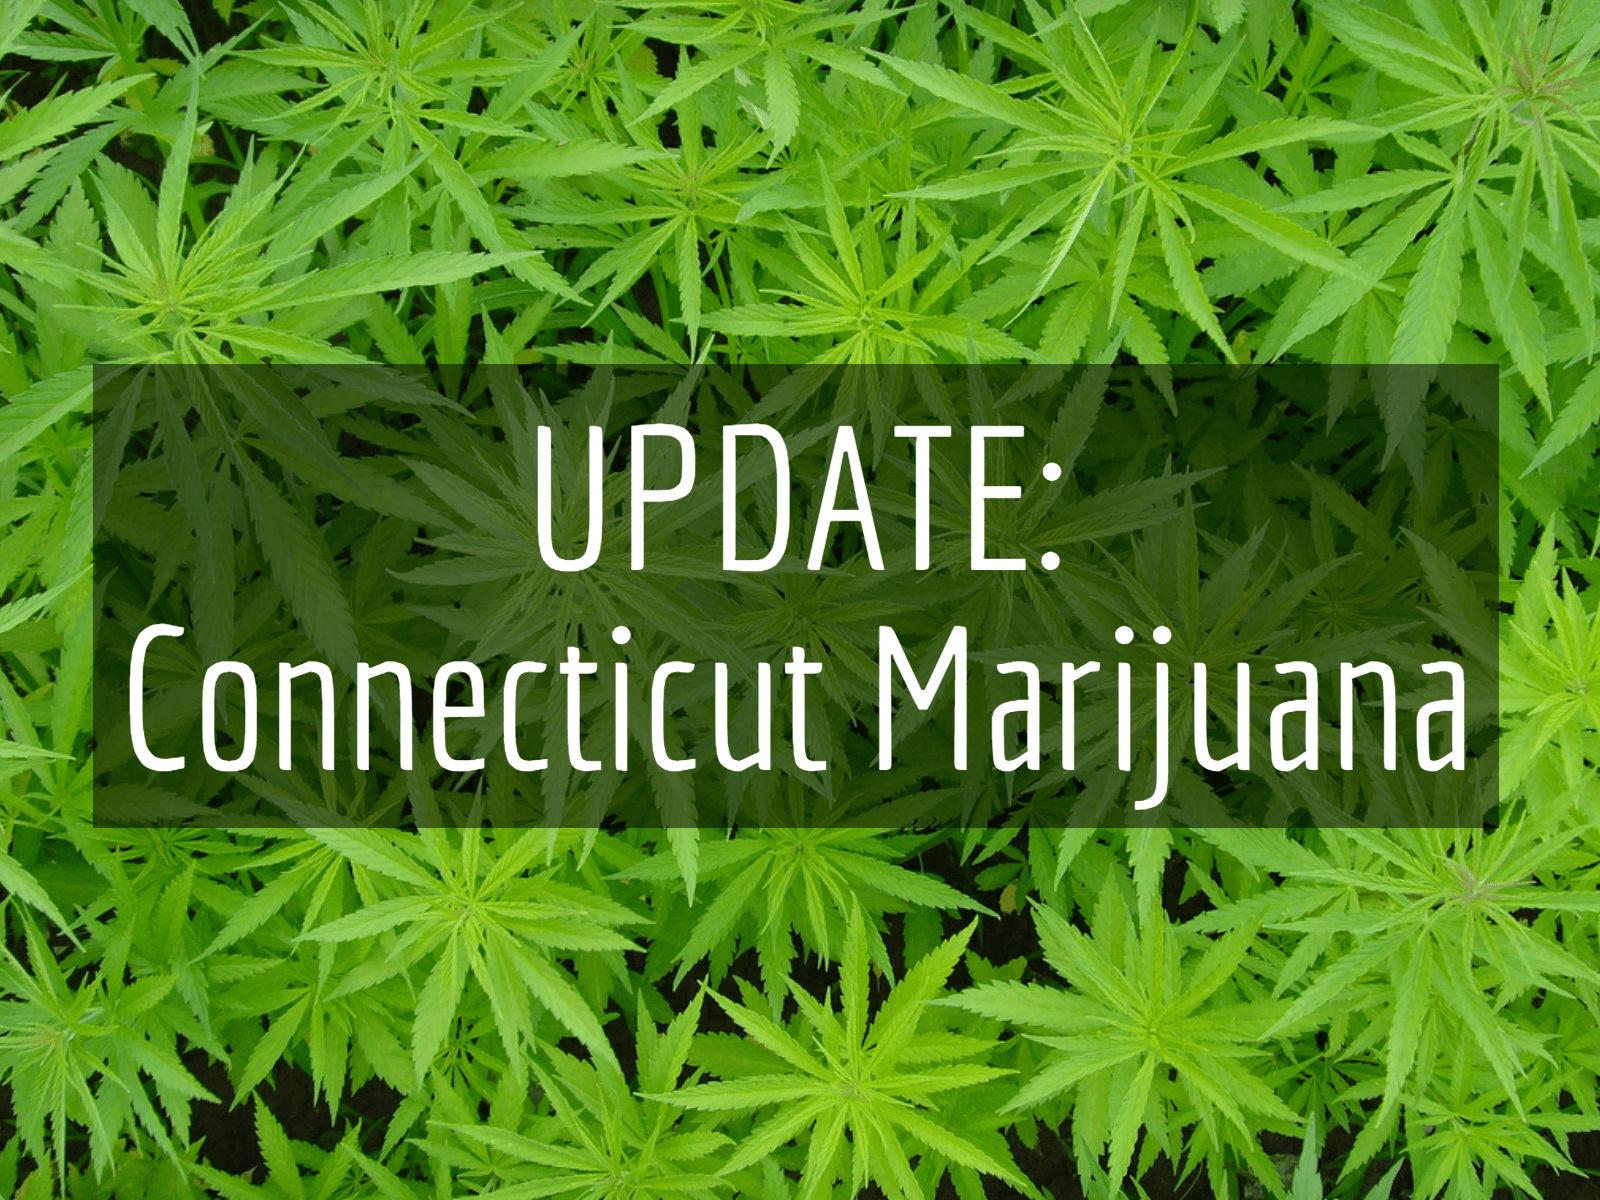 Connecticut Governor Threatens Cannabis Legalization Veto